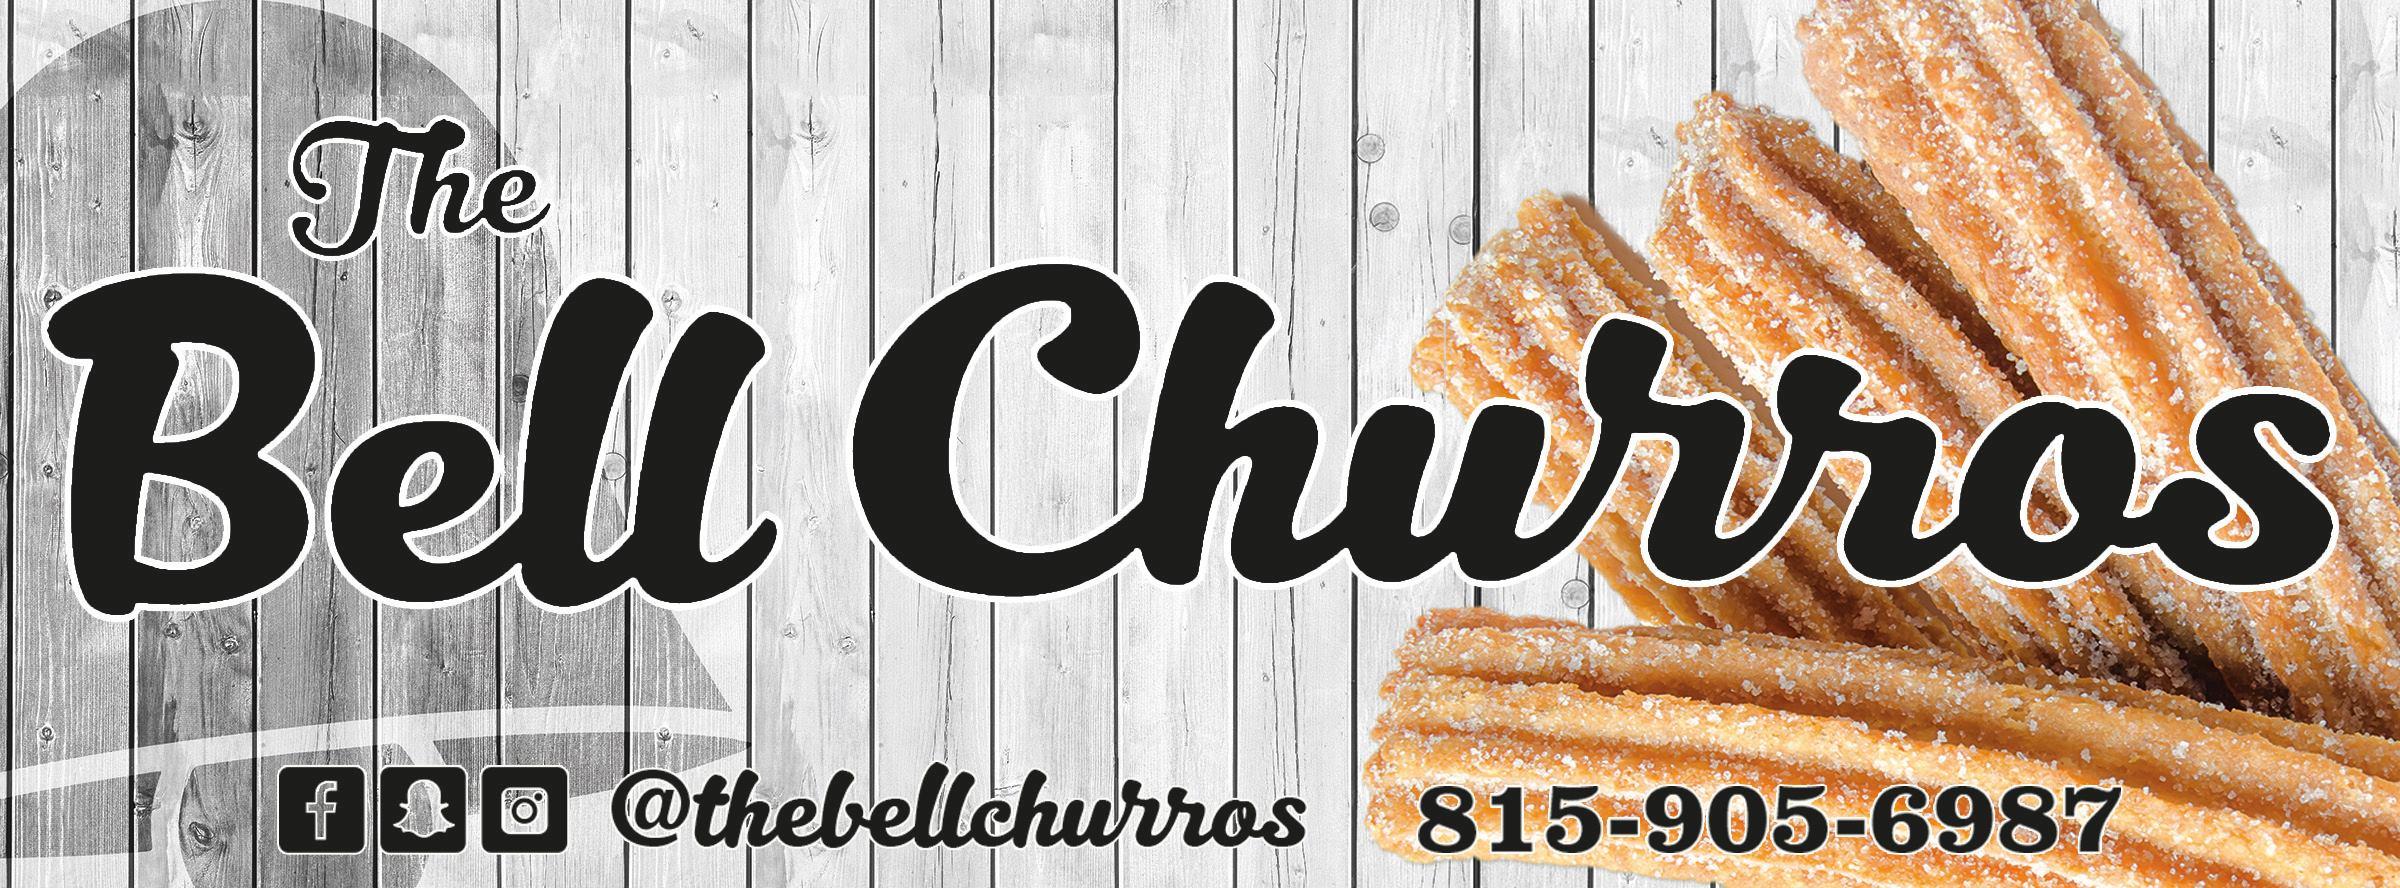 bell churros.jpg